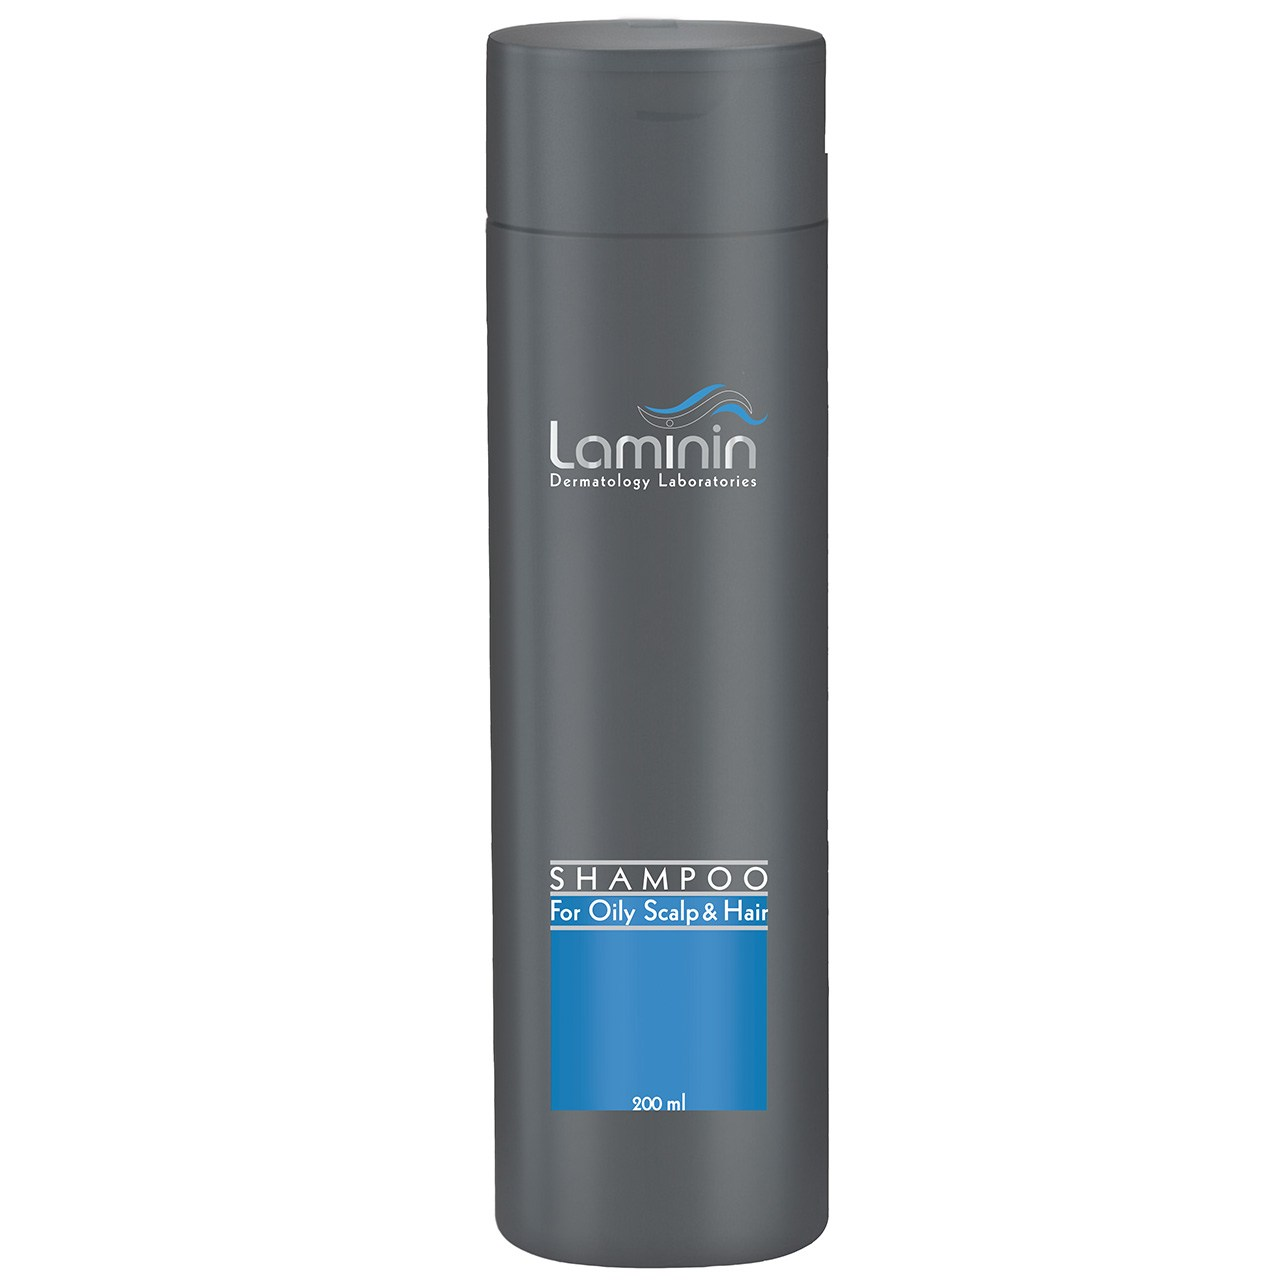 شامپو لامینین مناسب موهای چرب حجم 200 میلی لیتر